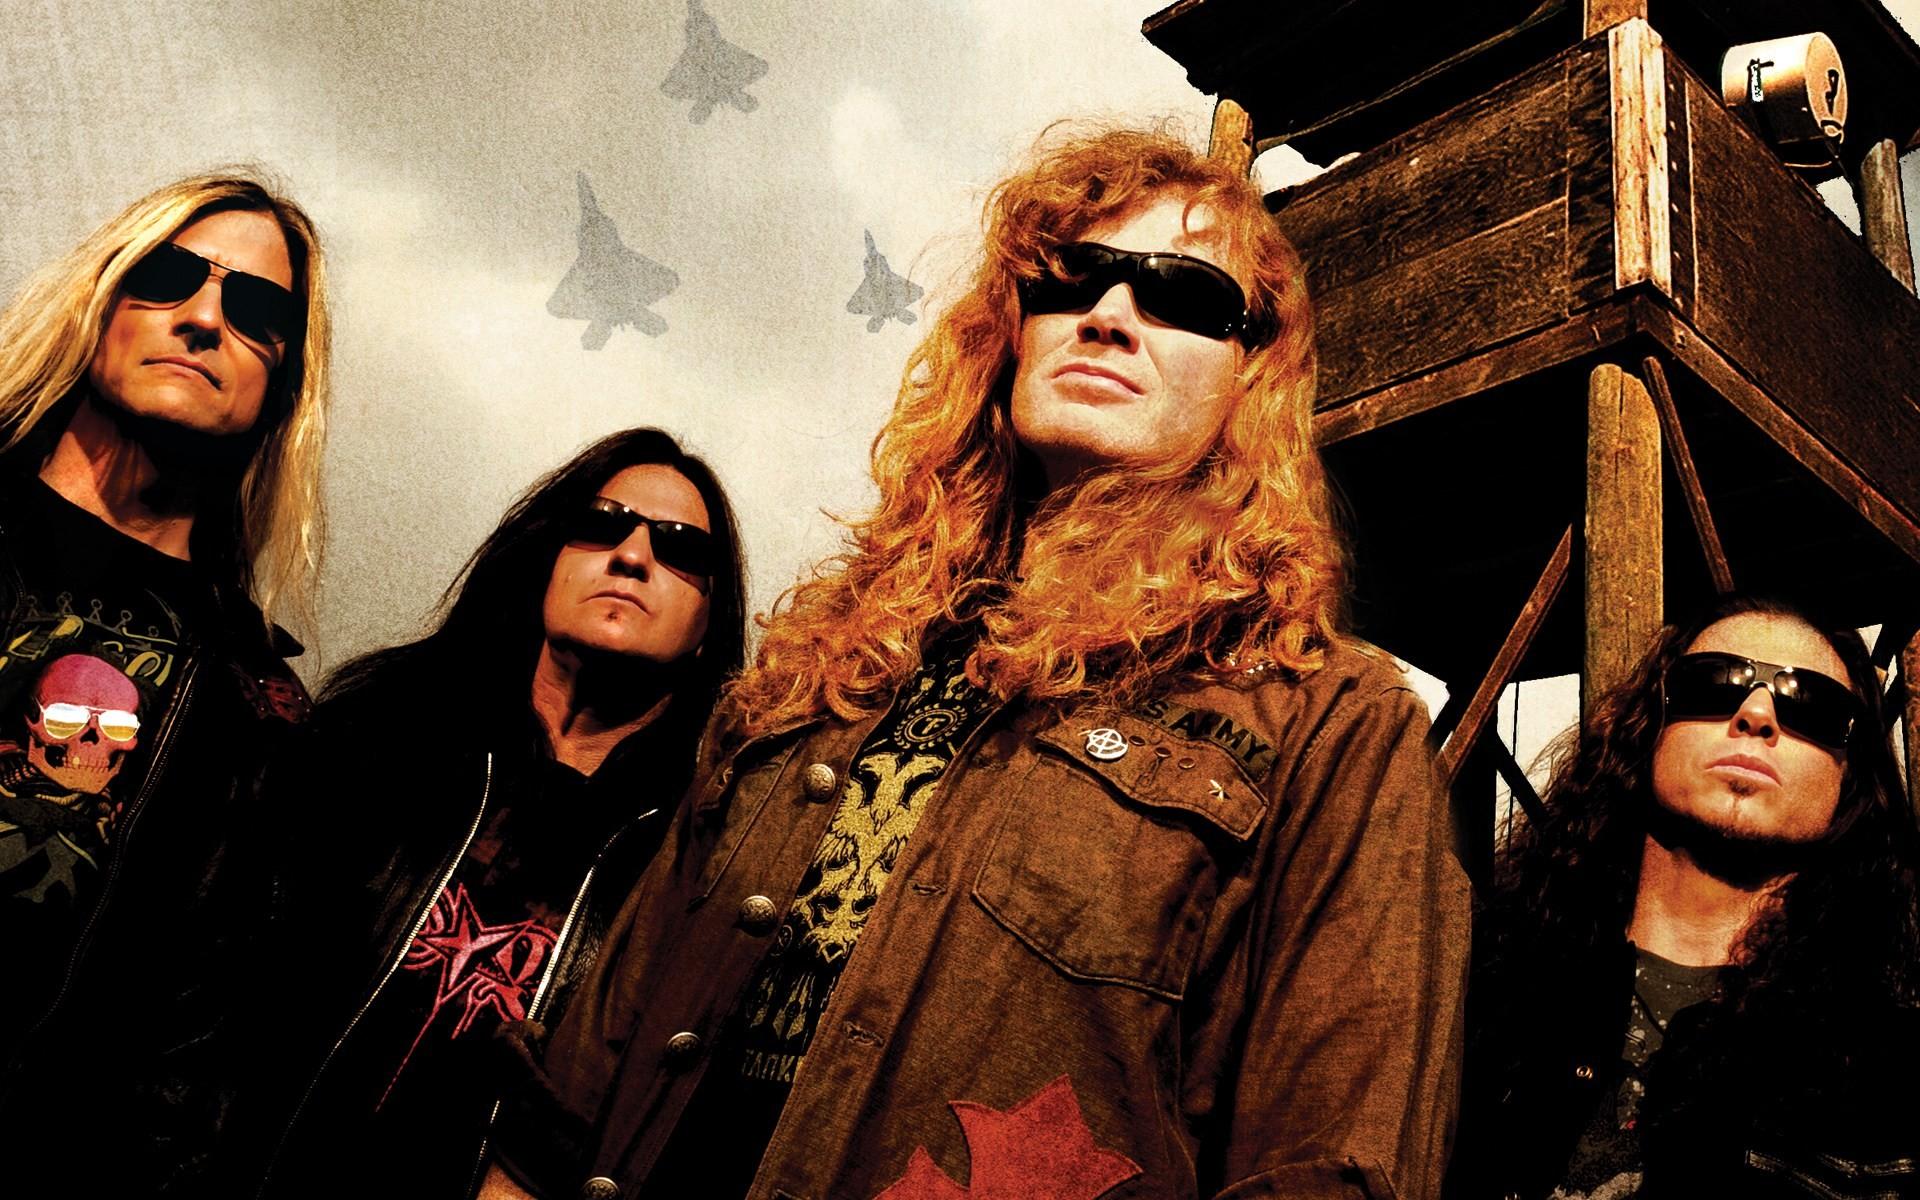 Shawn Drover Megadeth David Ellefson Dave Mustaine Chris Broderick 1080p HD  Wallpaper Background